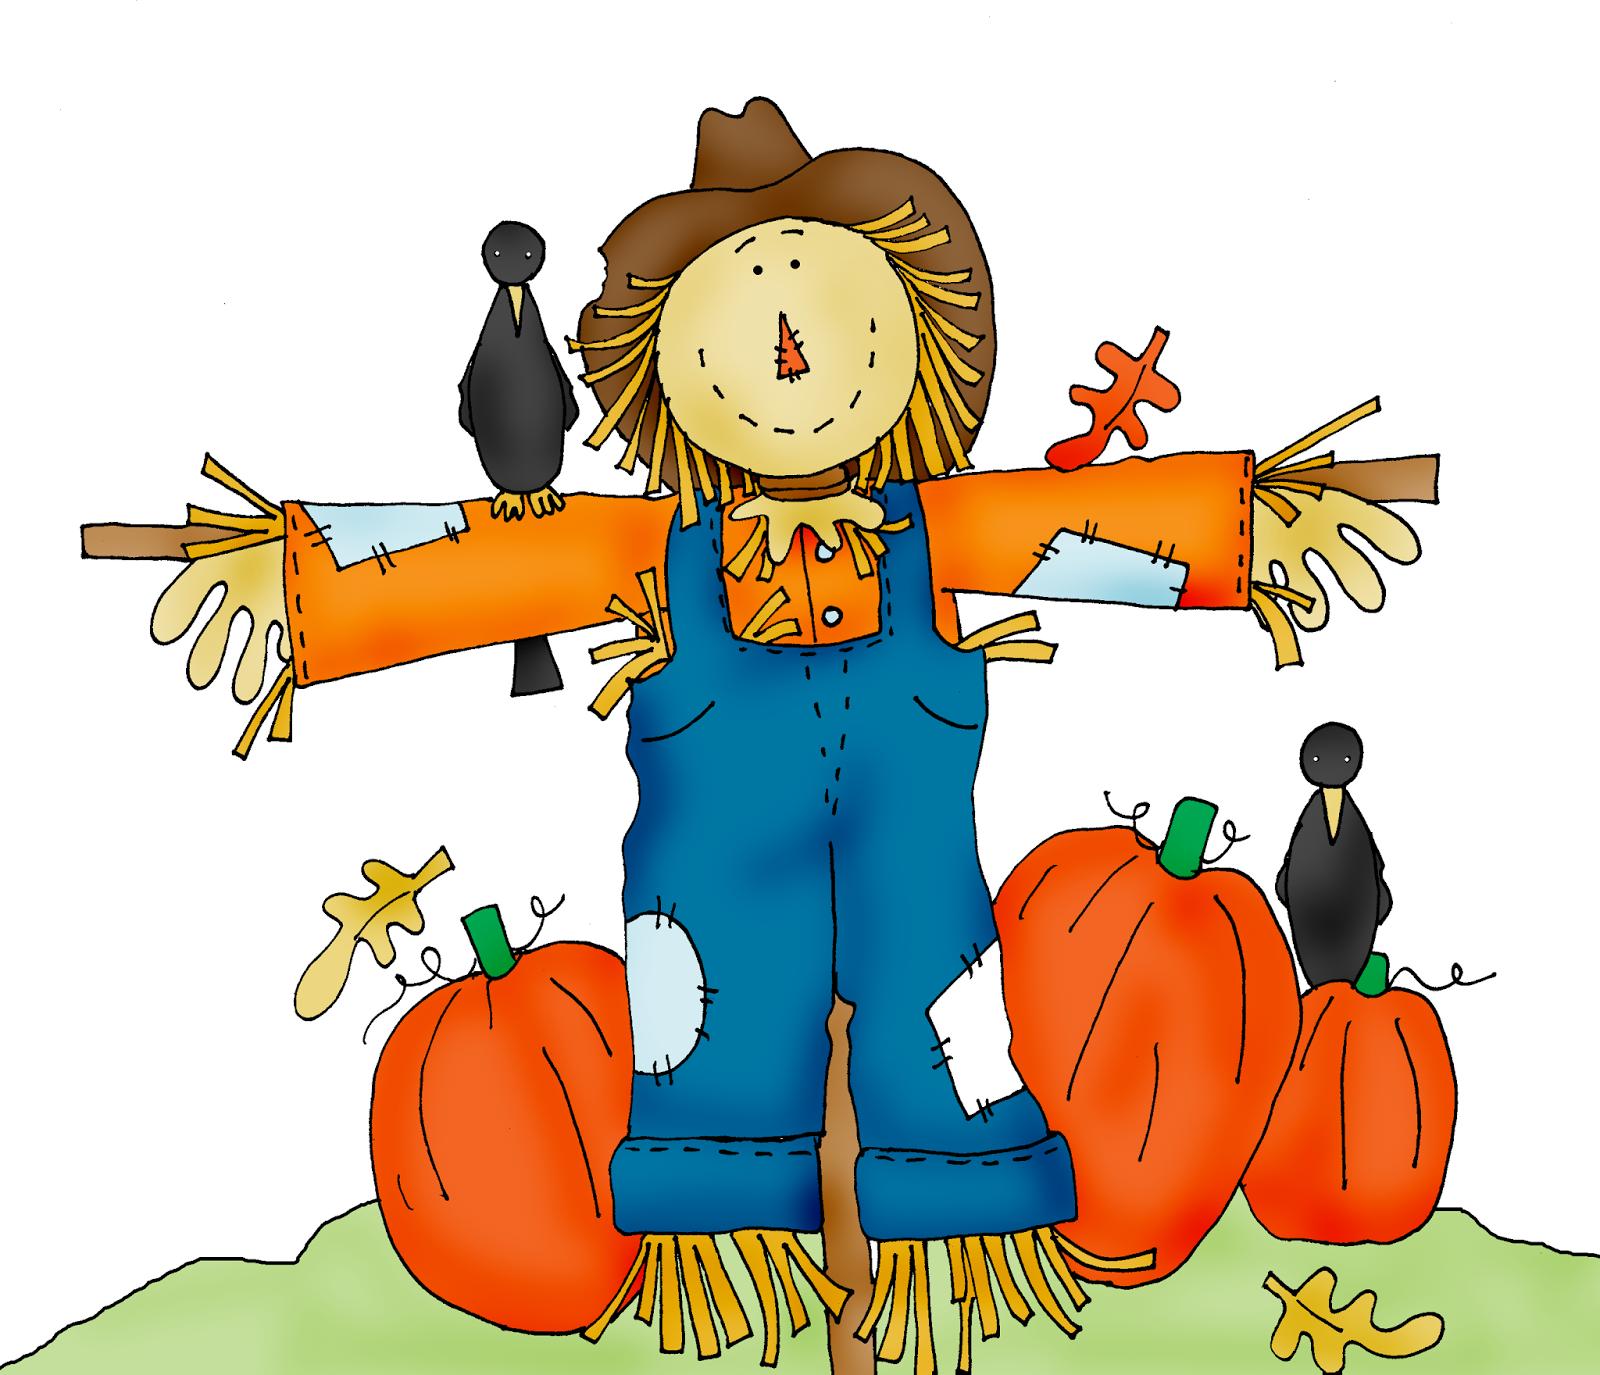 Scarecrow free halloween pumpkin patch c-Scarecrow free halloween pumpkin patch clipart-19